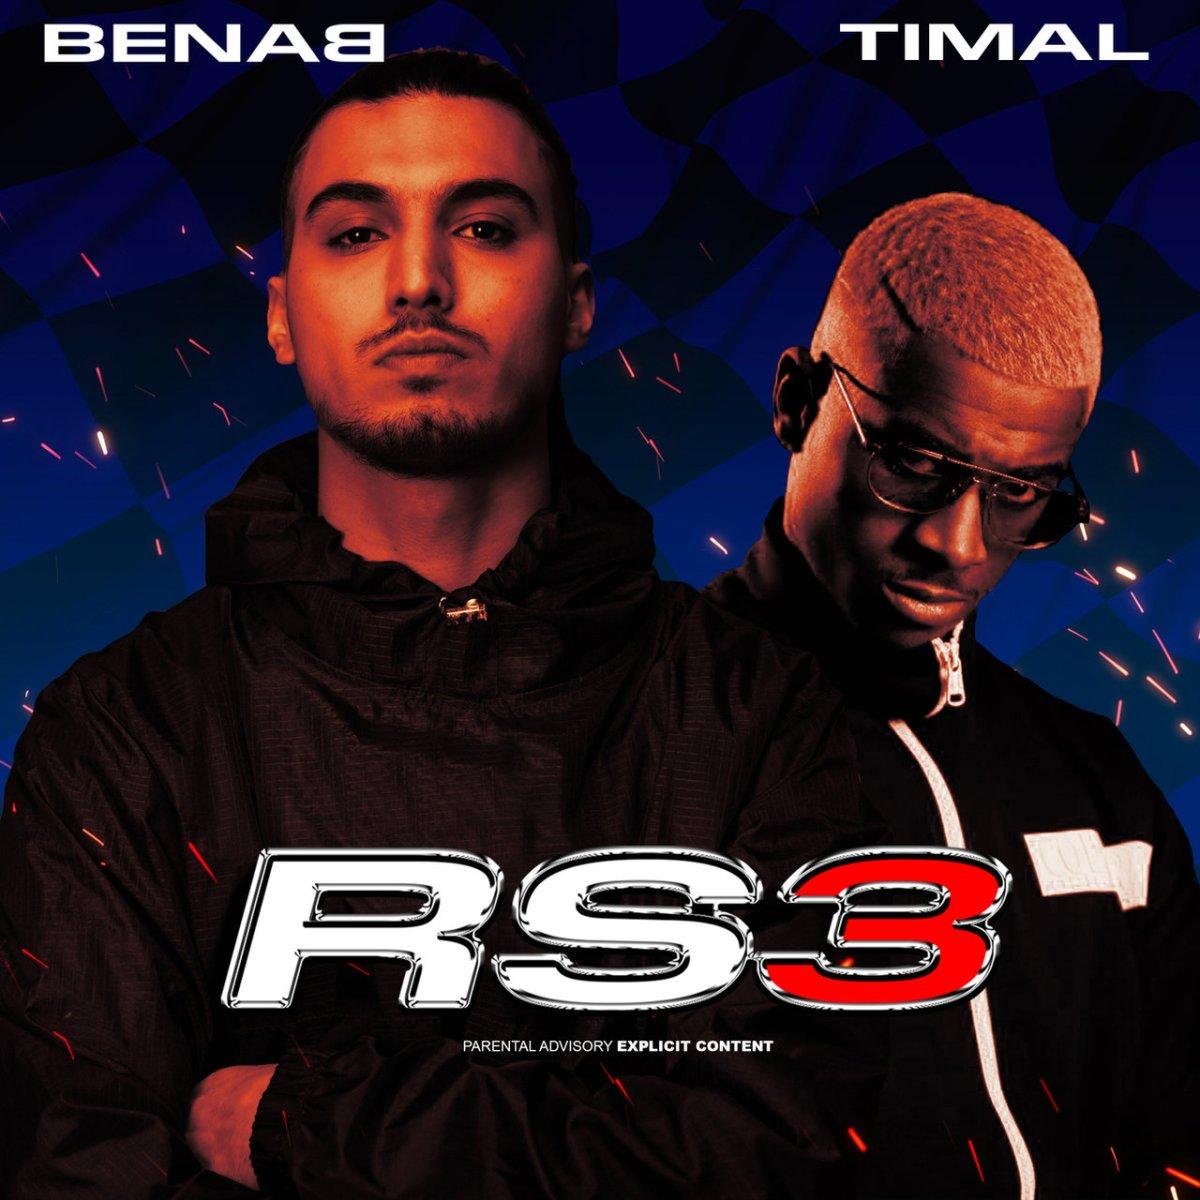 Benab - RS3 (ft. Timal) (Cover)